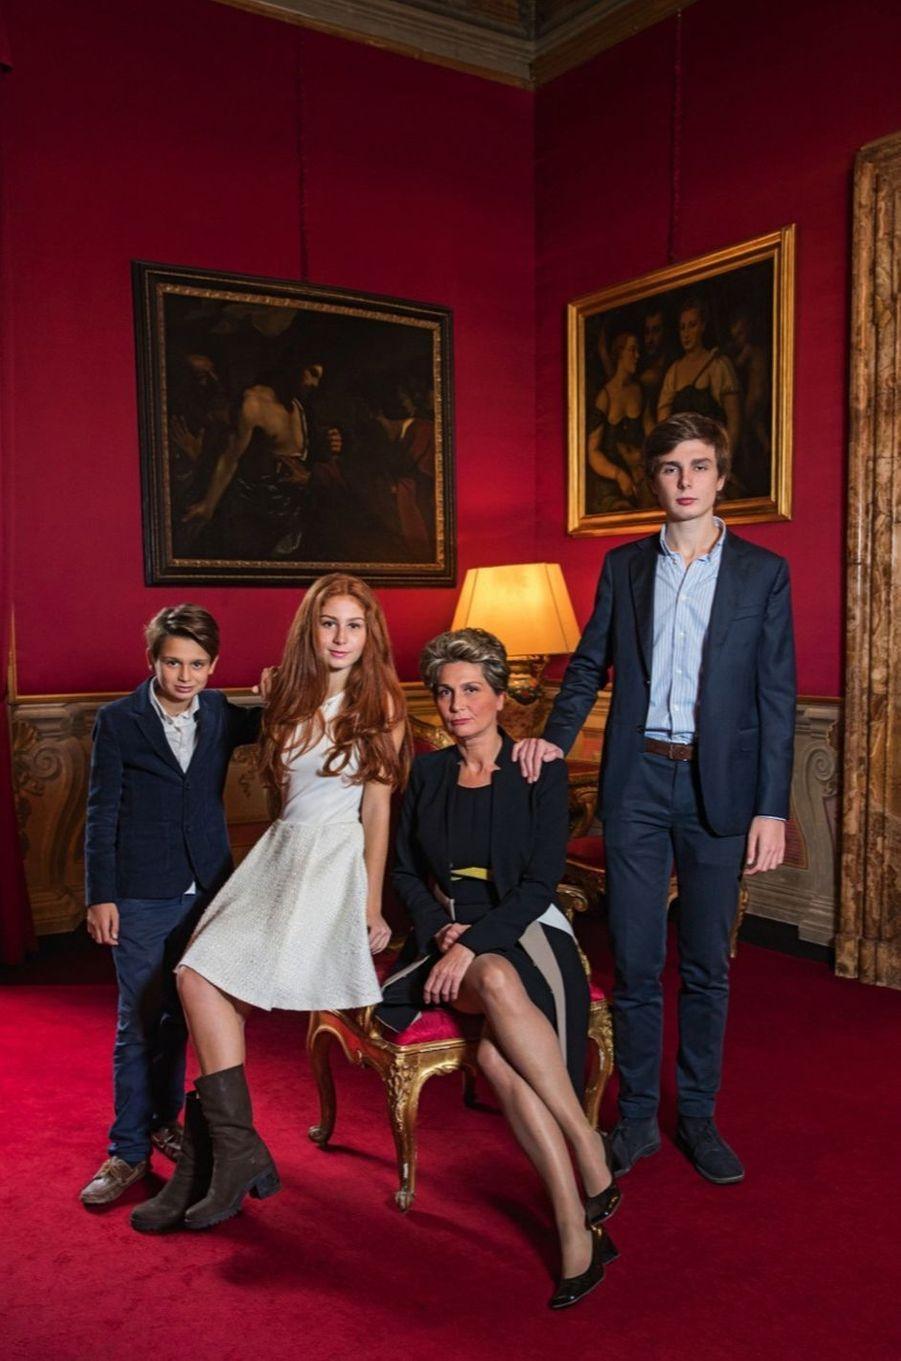 Altea Patrizi Naro Montoro, 16 ans. Avec sa mère, la marquise Flaminia Patrizi Naro Montoro, ses frères, Giulio, 12 ans, et Filippo, 18 ans, au Palazzo Patrizi, leur demeure romaine.